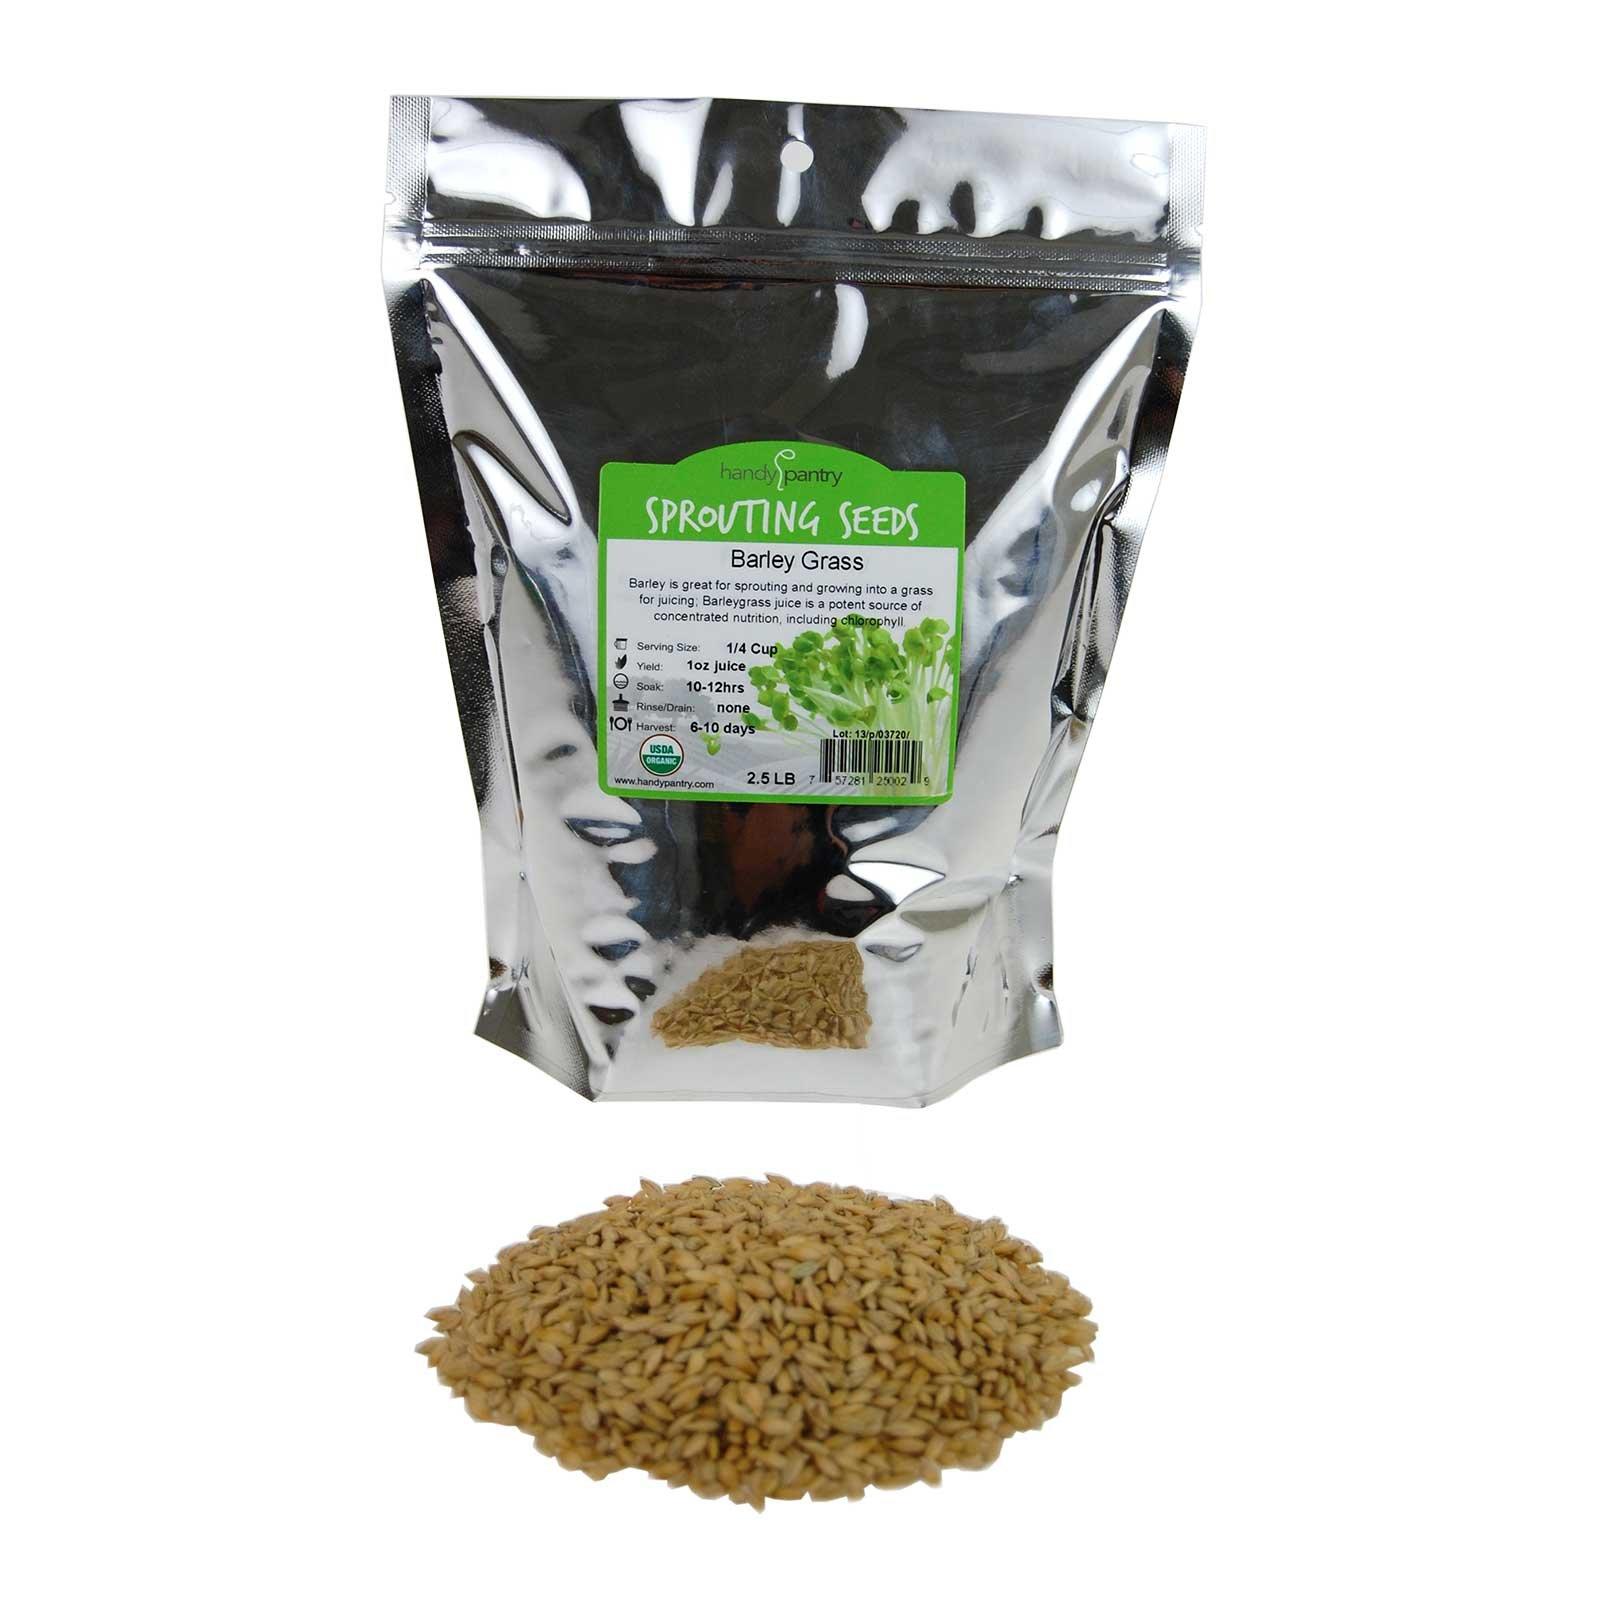 Handy Pantry Organic Barley Seeds - 2.5 Lbs - Whole (Hull Intact) Barleygrass Seed - Ornamental Barley Grass, Juicing - Grain for Beer Making, Emergency Food Storage & More by Handy Pantry (Image #1)